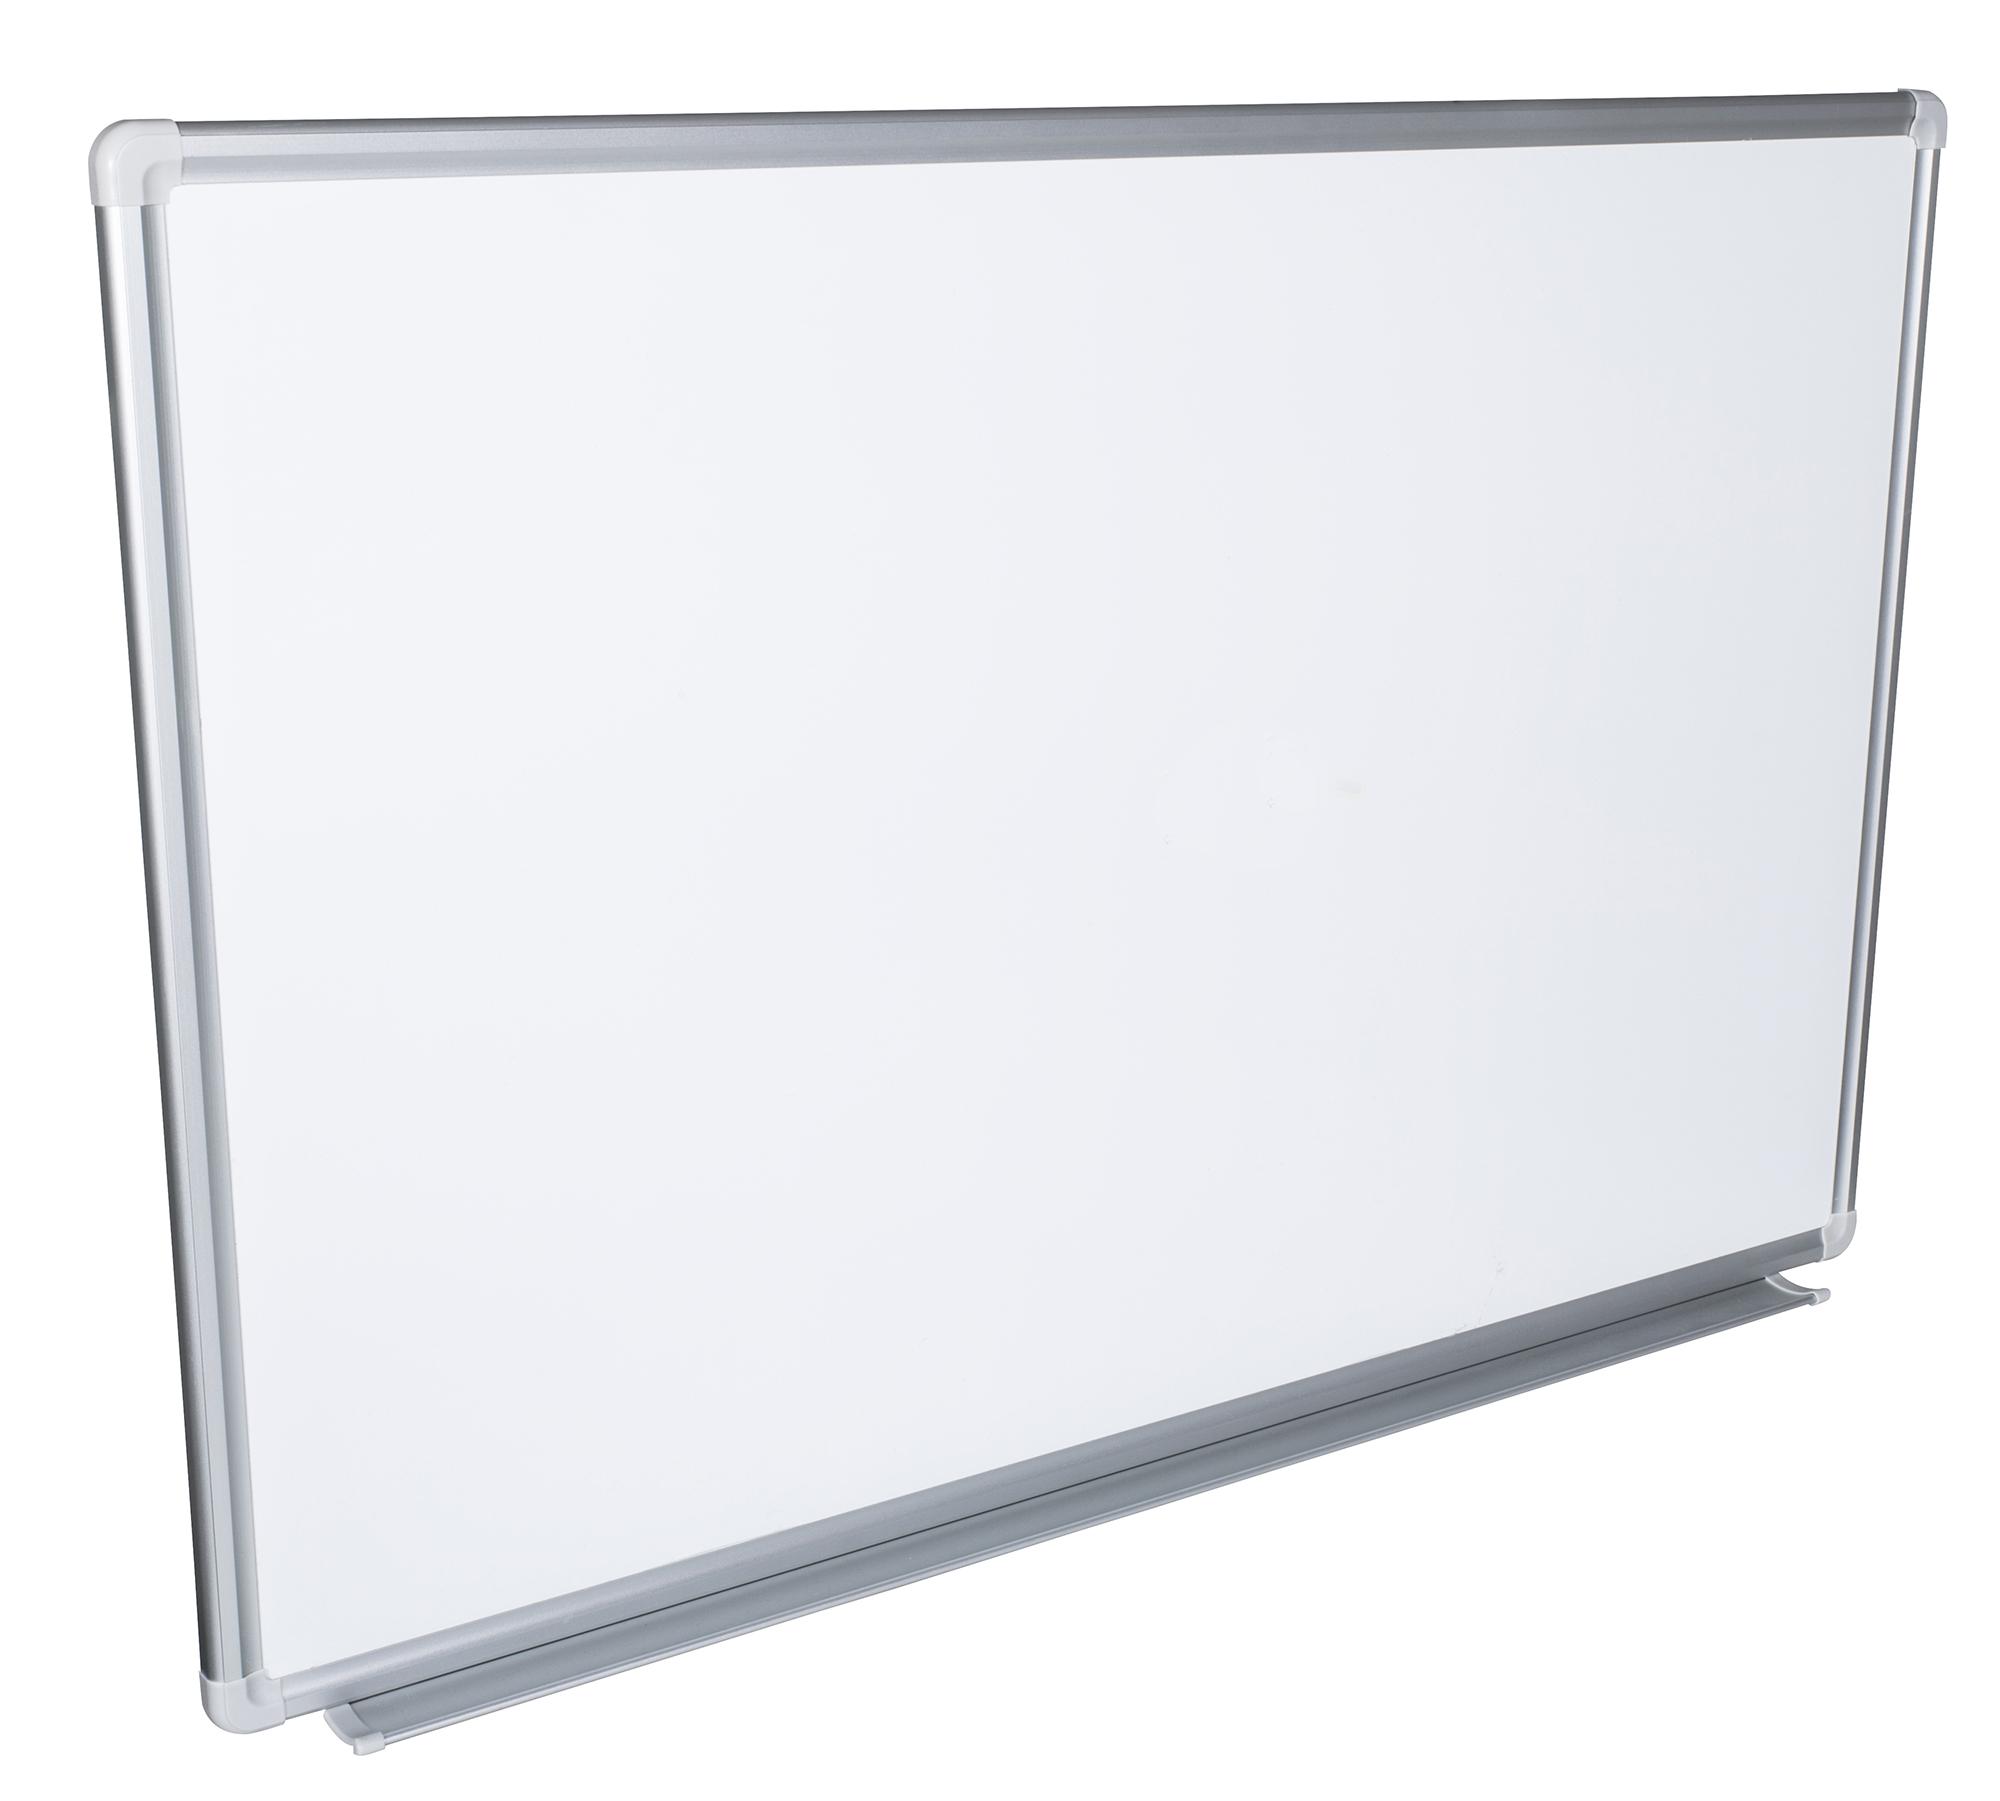 Magnettafel Memoboard 45 x 60 cm